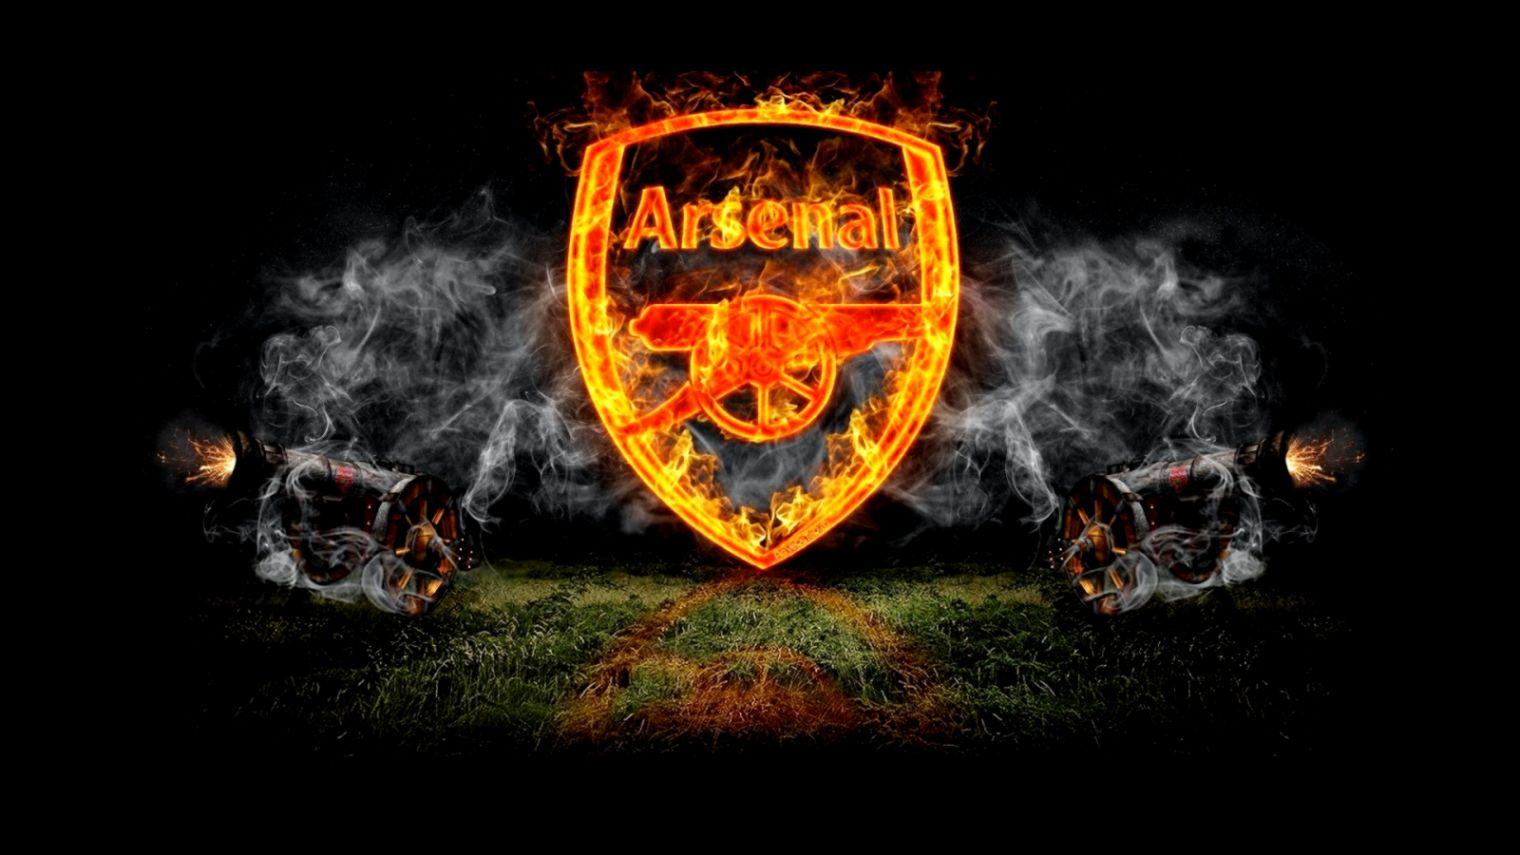 Arsenal the gunners wallpaper hd wallpaper gallery for Home 2015 wallpaper hd